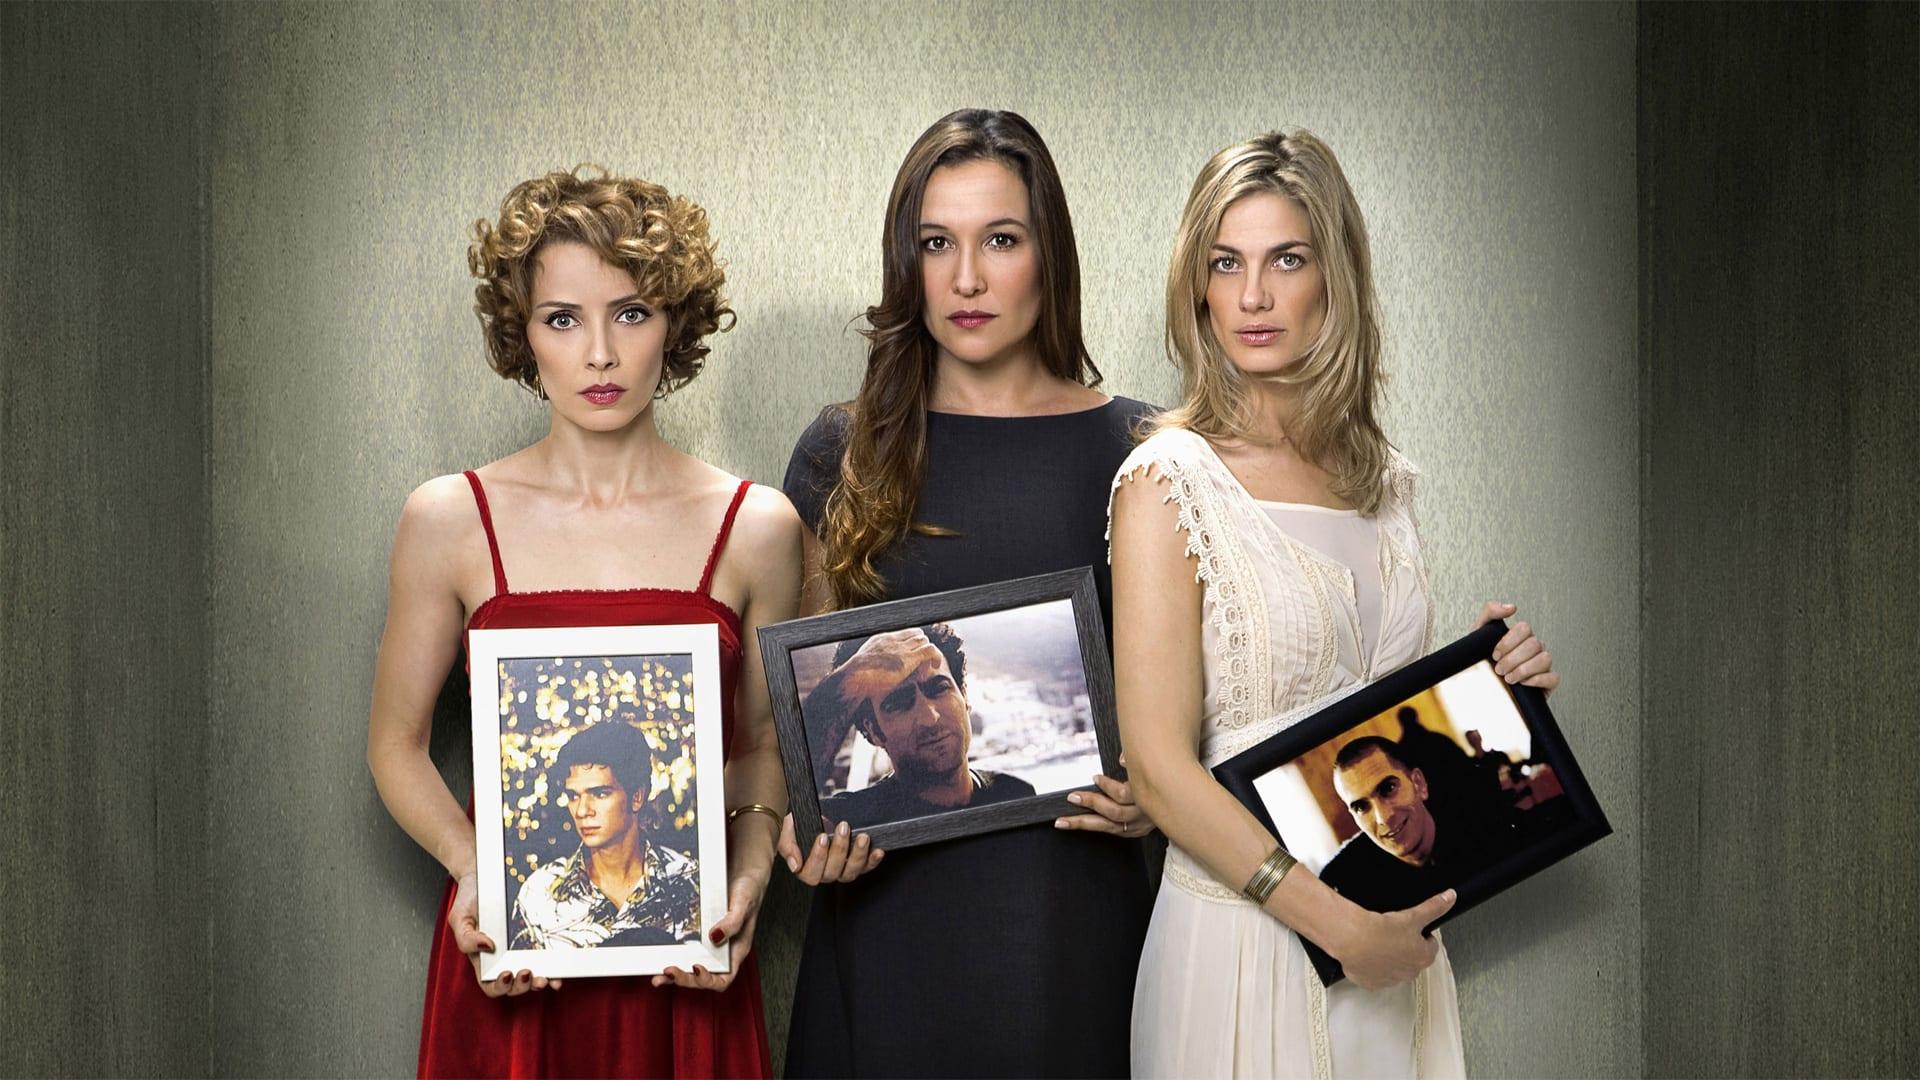 Gossip Girl 1 - Home - Burning Series: Serien online